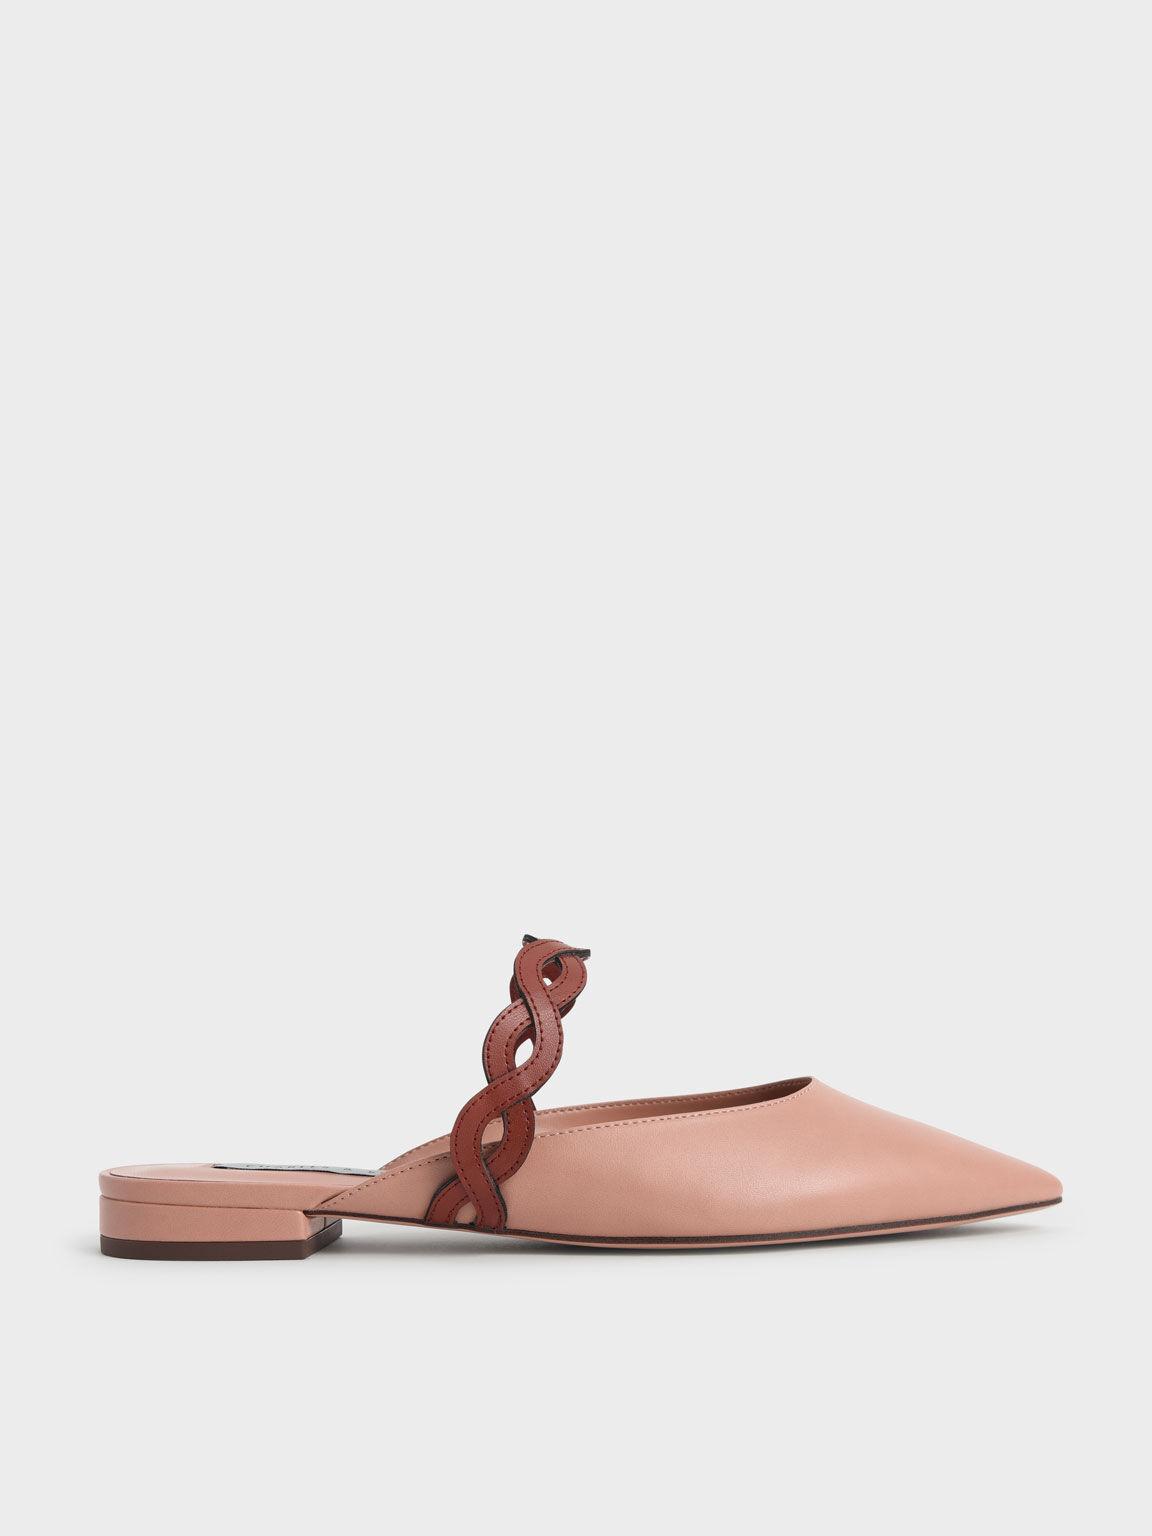 編織帶穆勒鞋, 粉紅色, hi-res